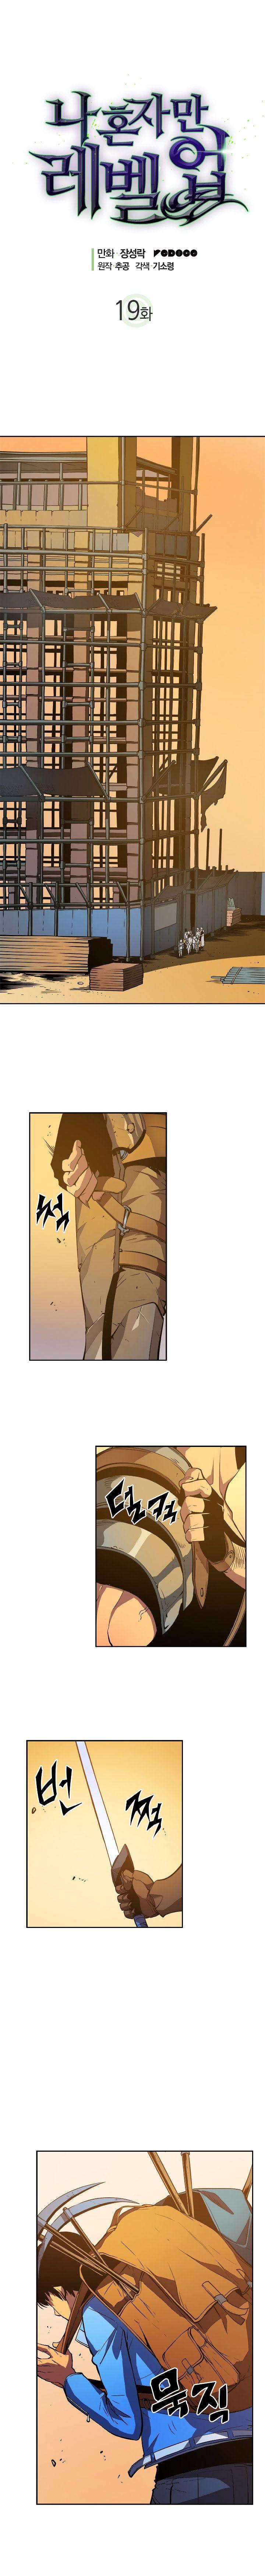 https://r1.ninemanga.com/comics/pic3/13/35341/1292549/1545648812842.jpg Page 1